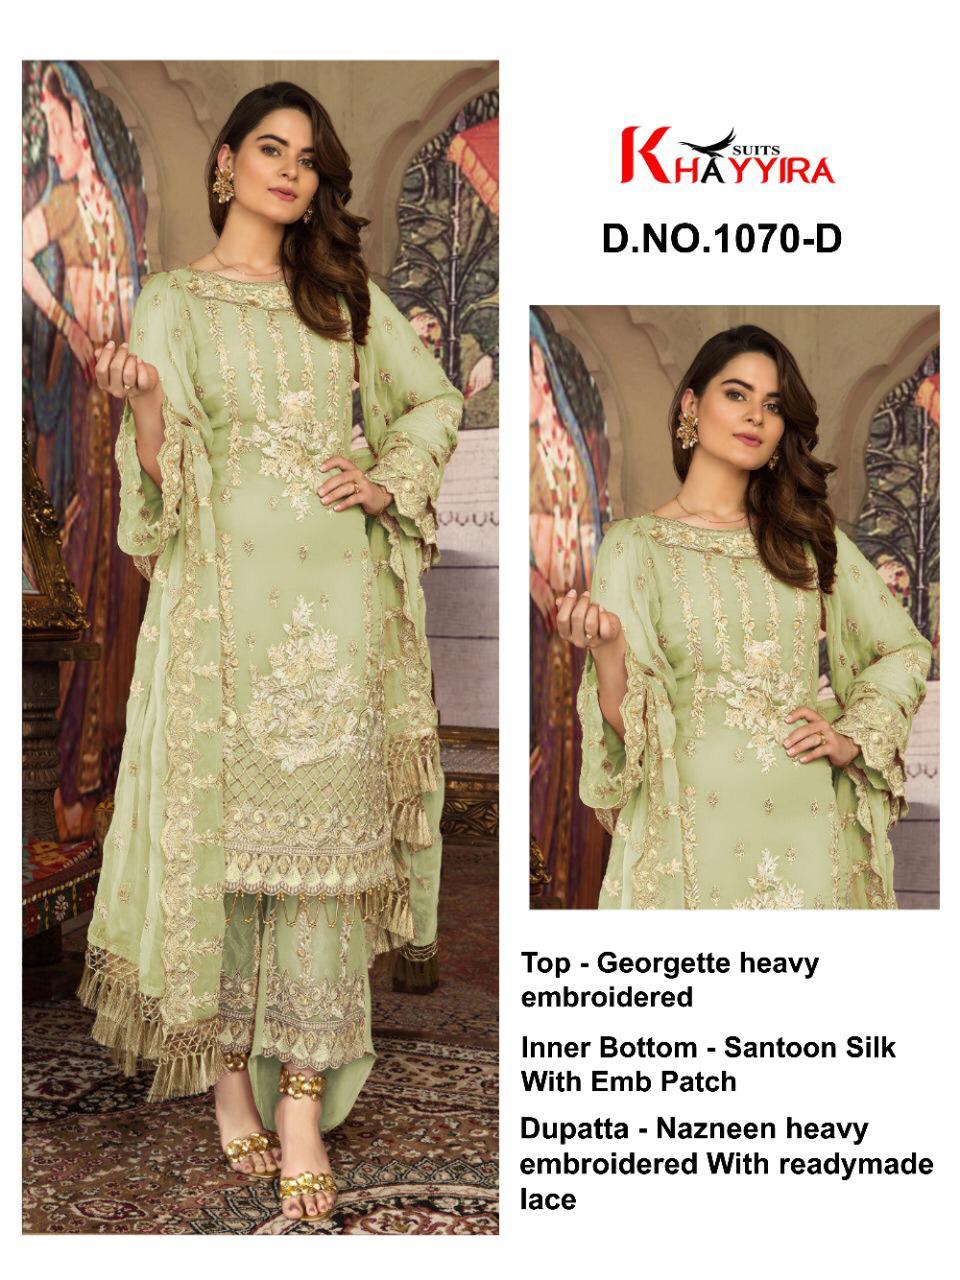 Khayyira Block Buster Vol 2 Salwar Suit Wholesale Catalog 4 Pcs 5 - Khayyira Block Buster Vol 2 Salwar Suit Wholesale Catalog 4 Pcs